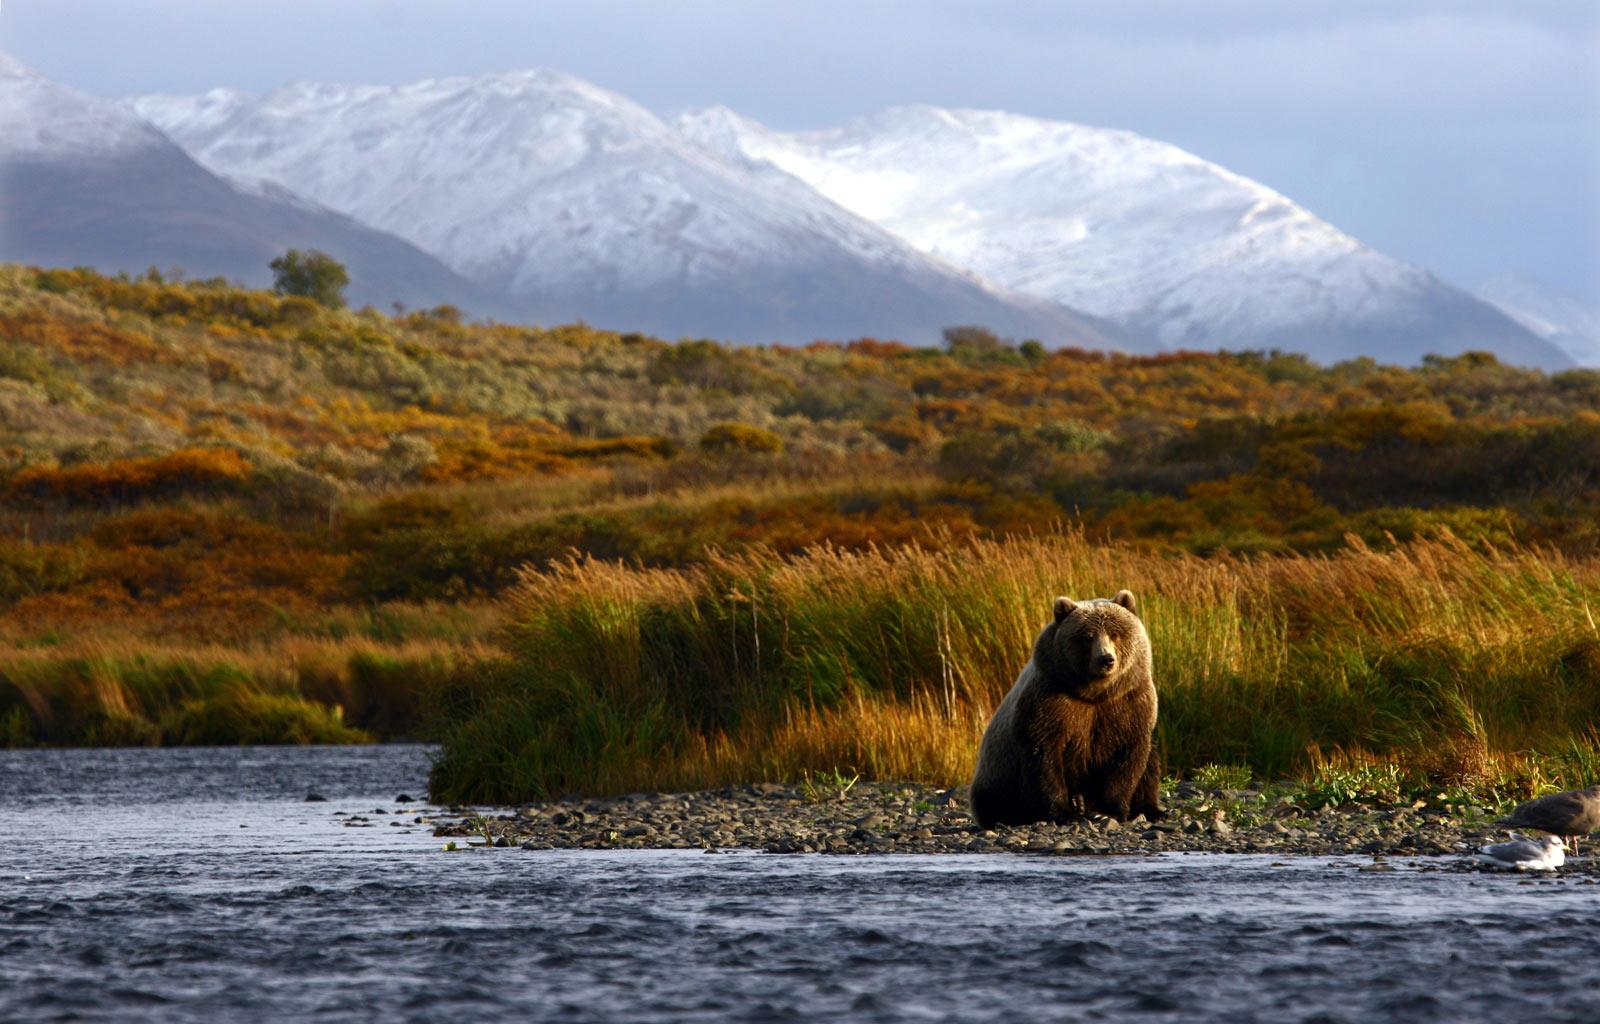 Kodiak National Wildlife Refuge in Alaska